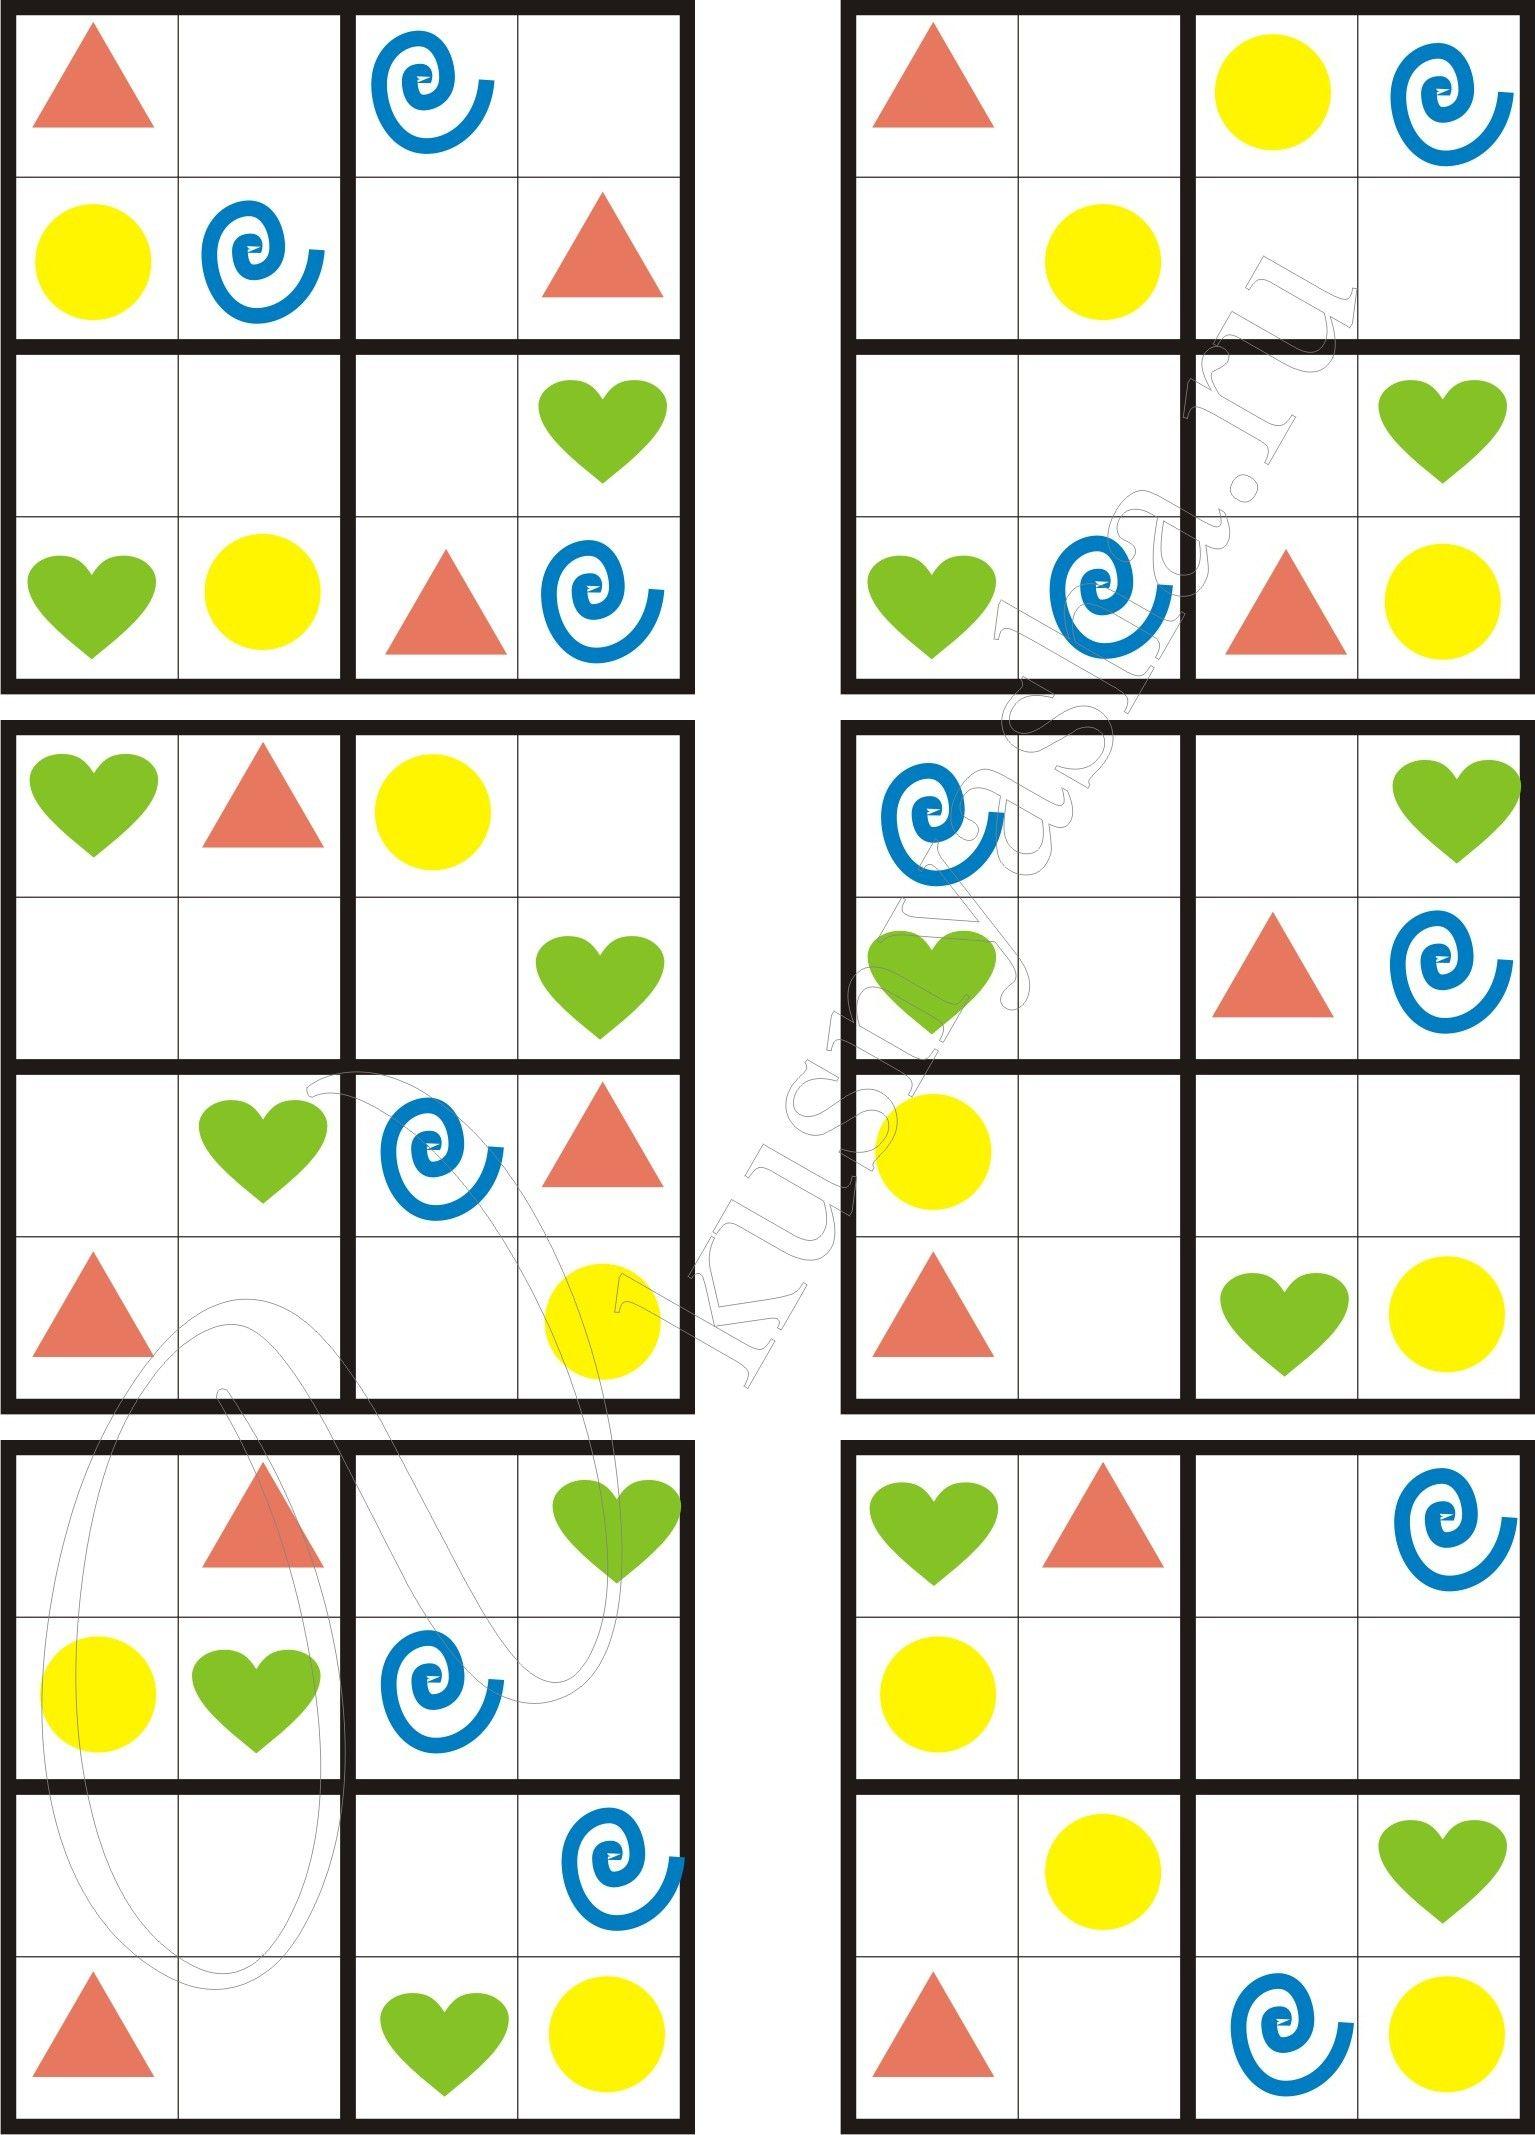 Sudoku 4Х4 con dibujos. Planificación. Percepción espacial. Atencion ...